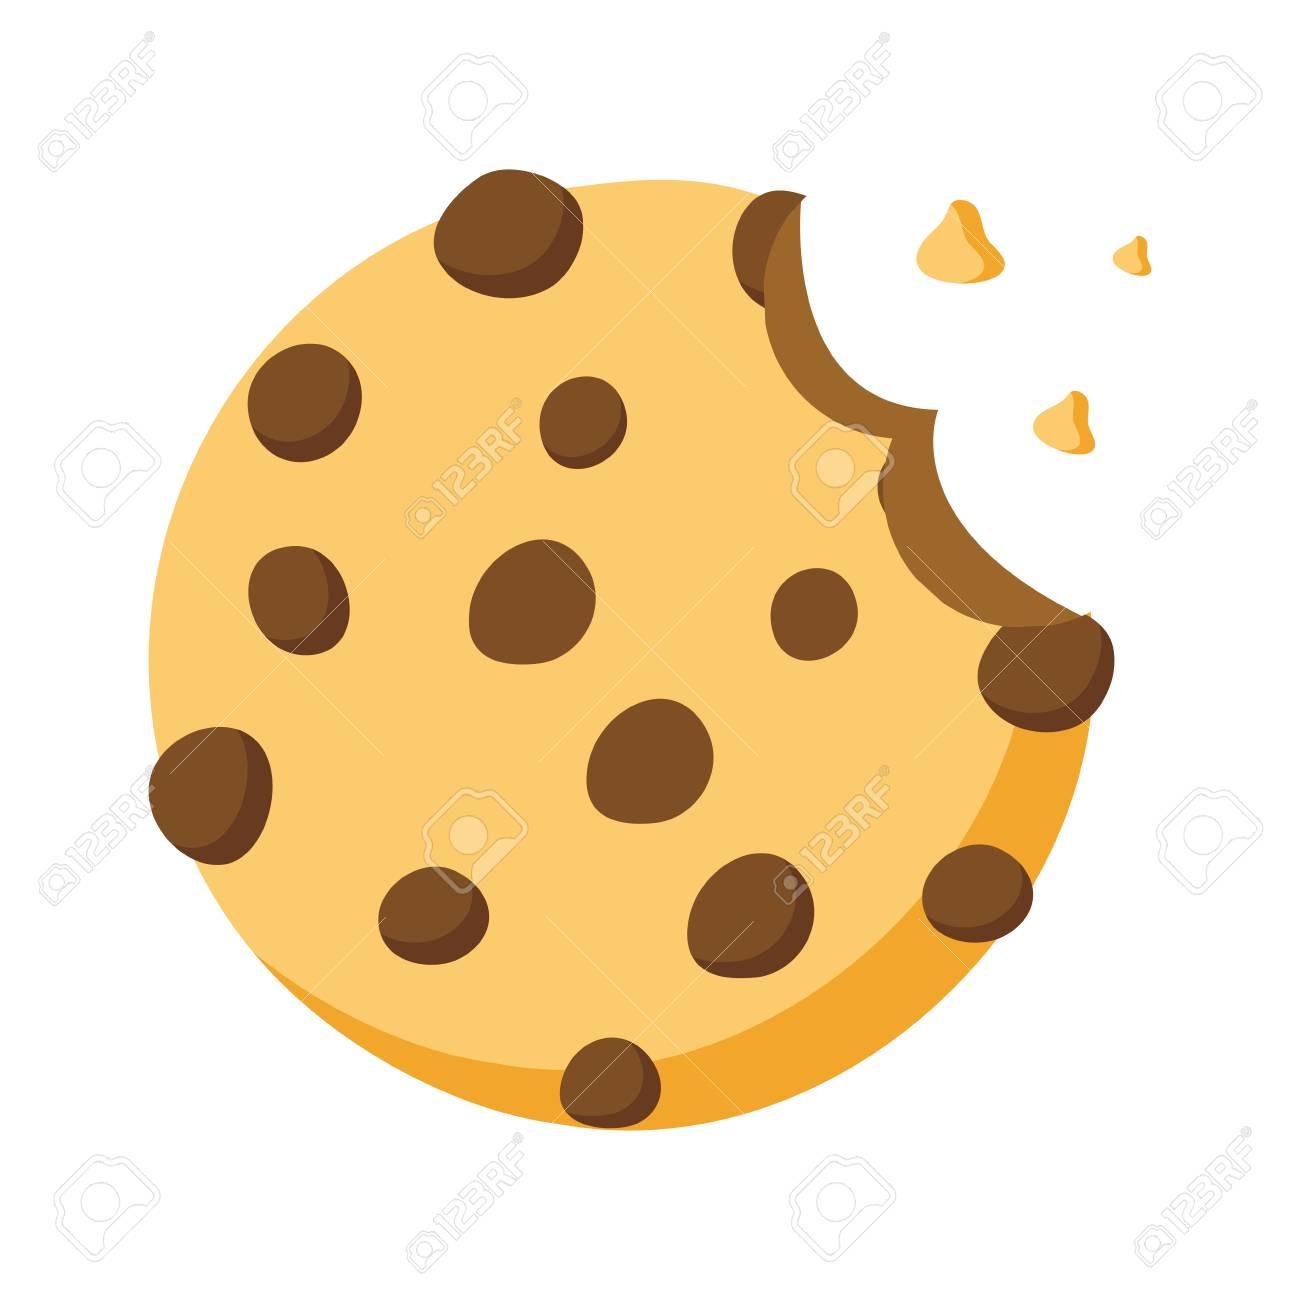 sweet cookie dessert bite vector illustration design - 119798786